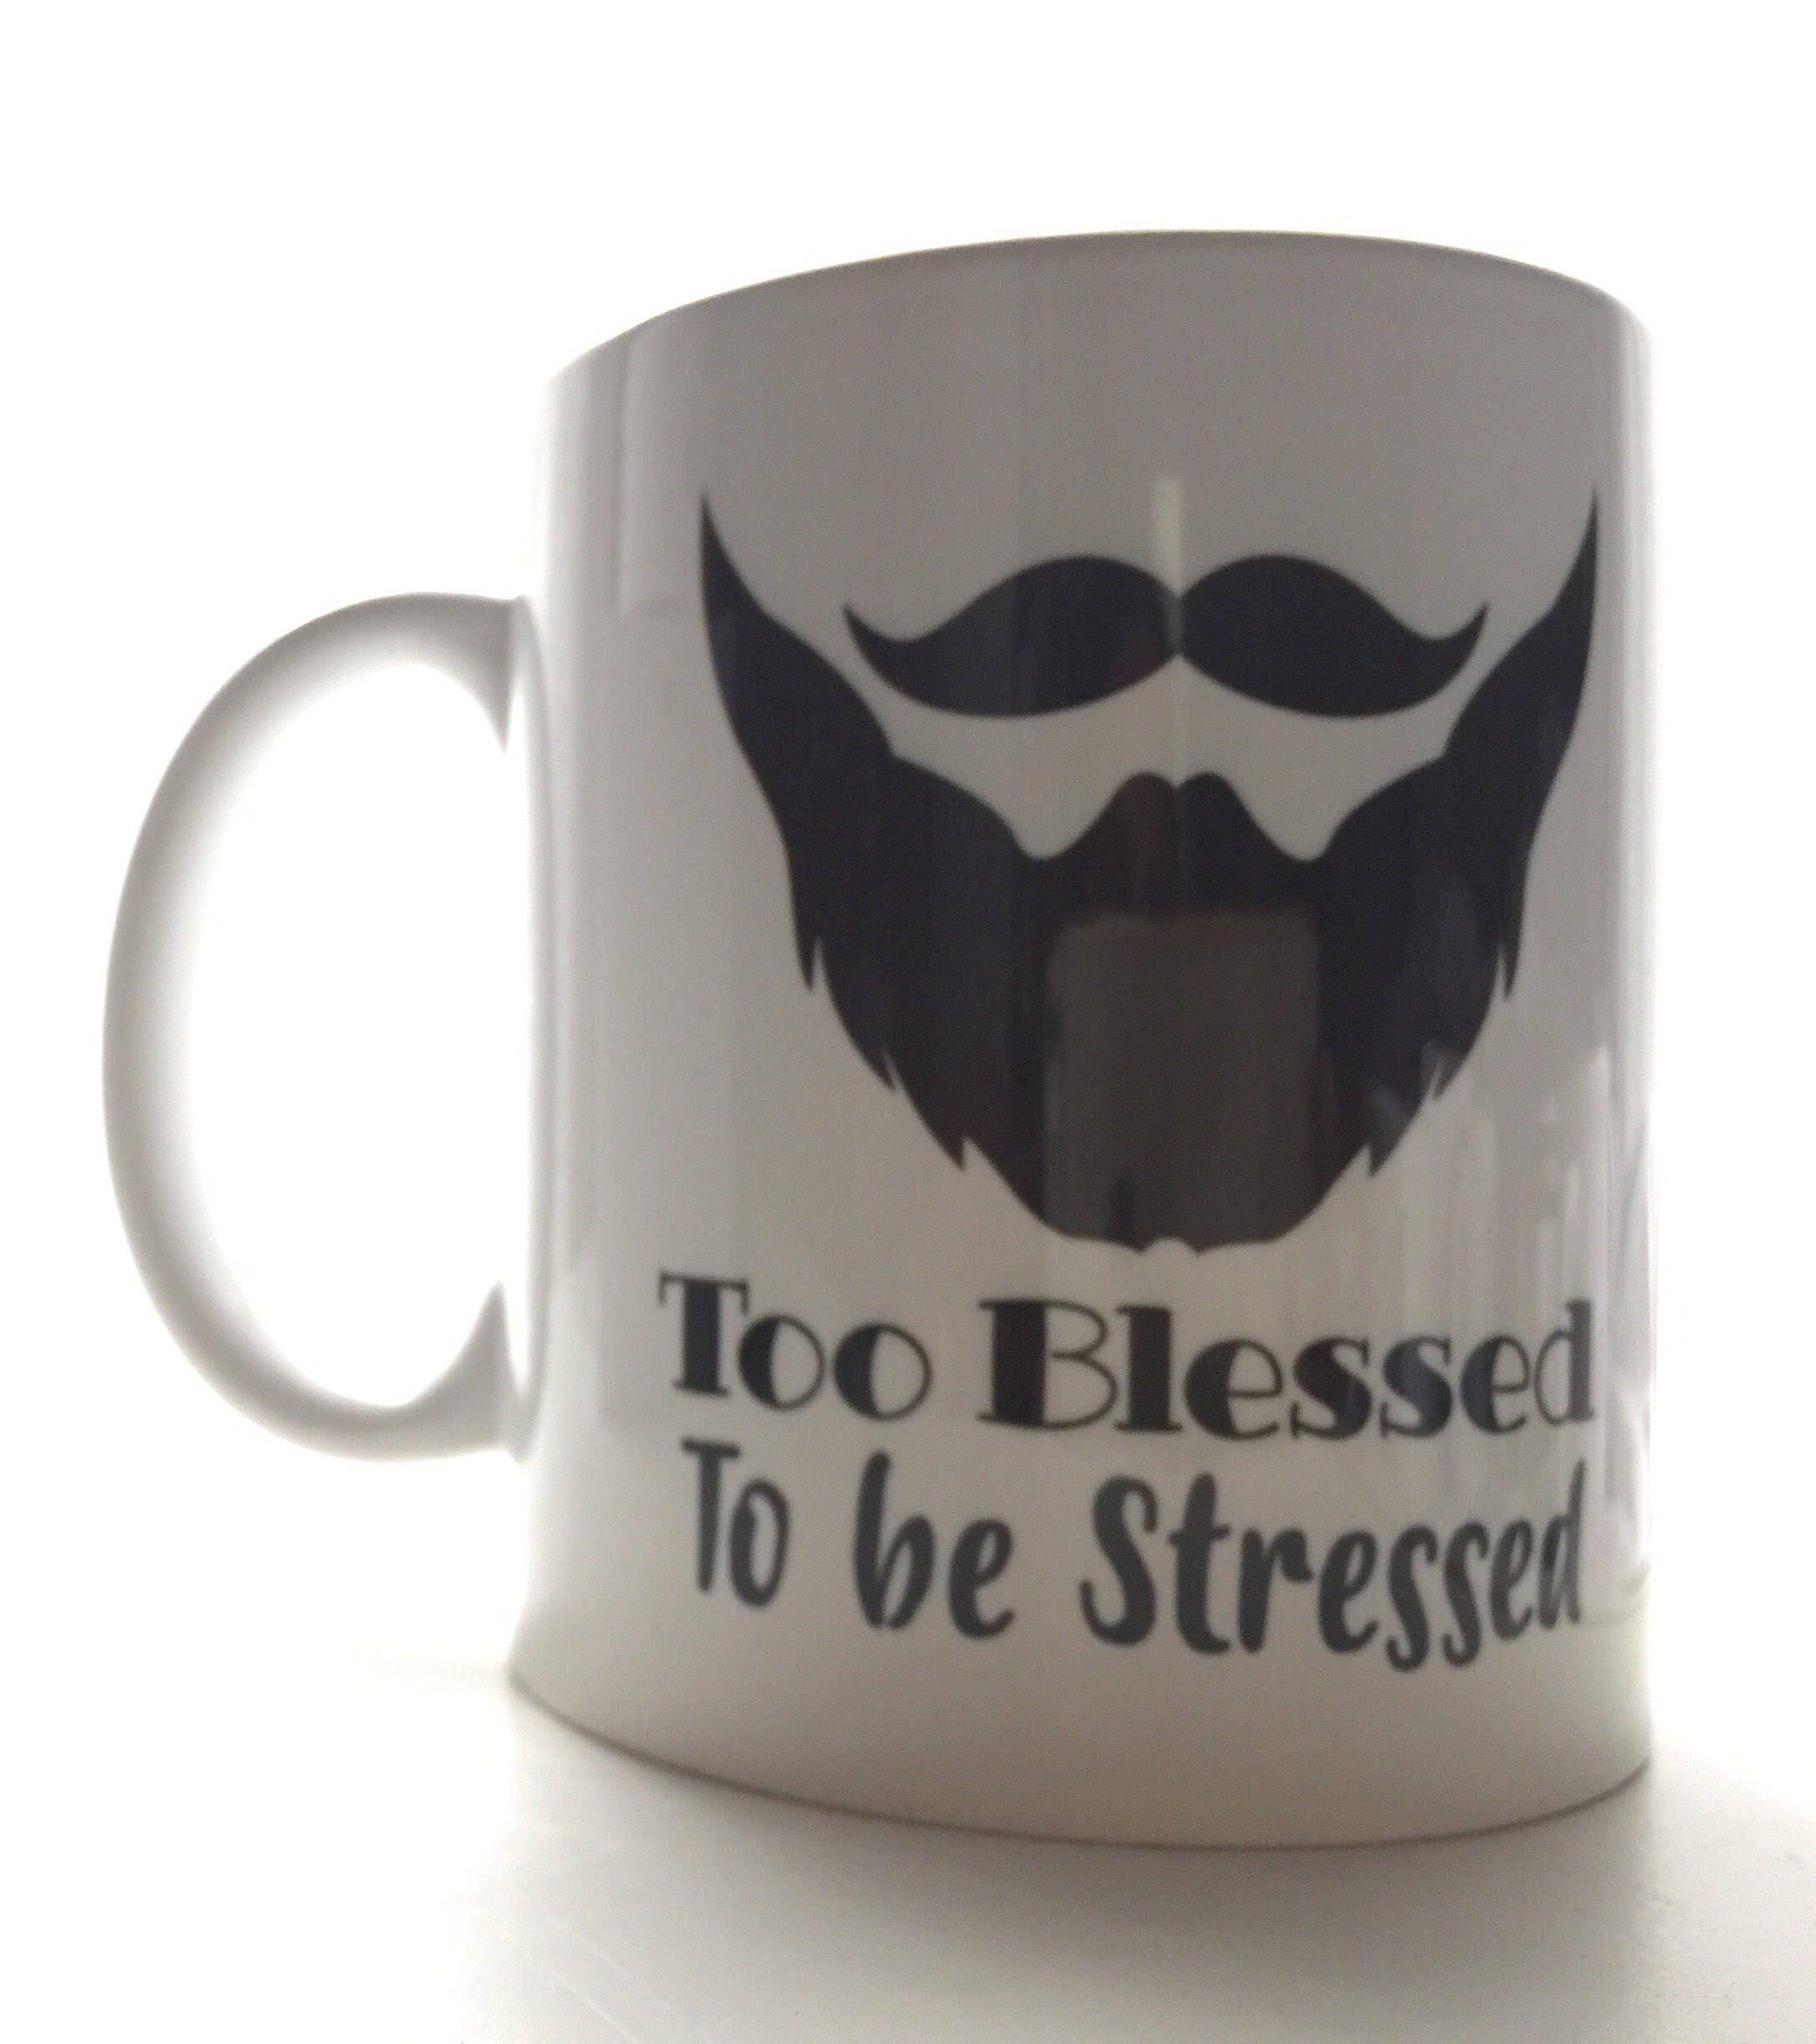 Personalized mugs cheap uk - Beard Mugs Islamic Mugs Arabic Mugs Eid Gifts Raamadan Eid Personalised Mugs Islamic Gifts Arabic Mugs Muslim Gifts